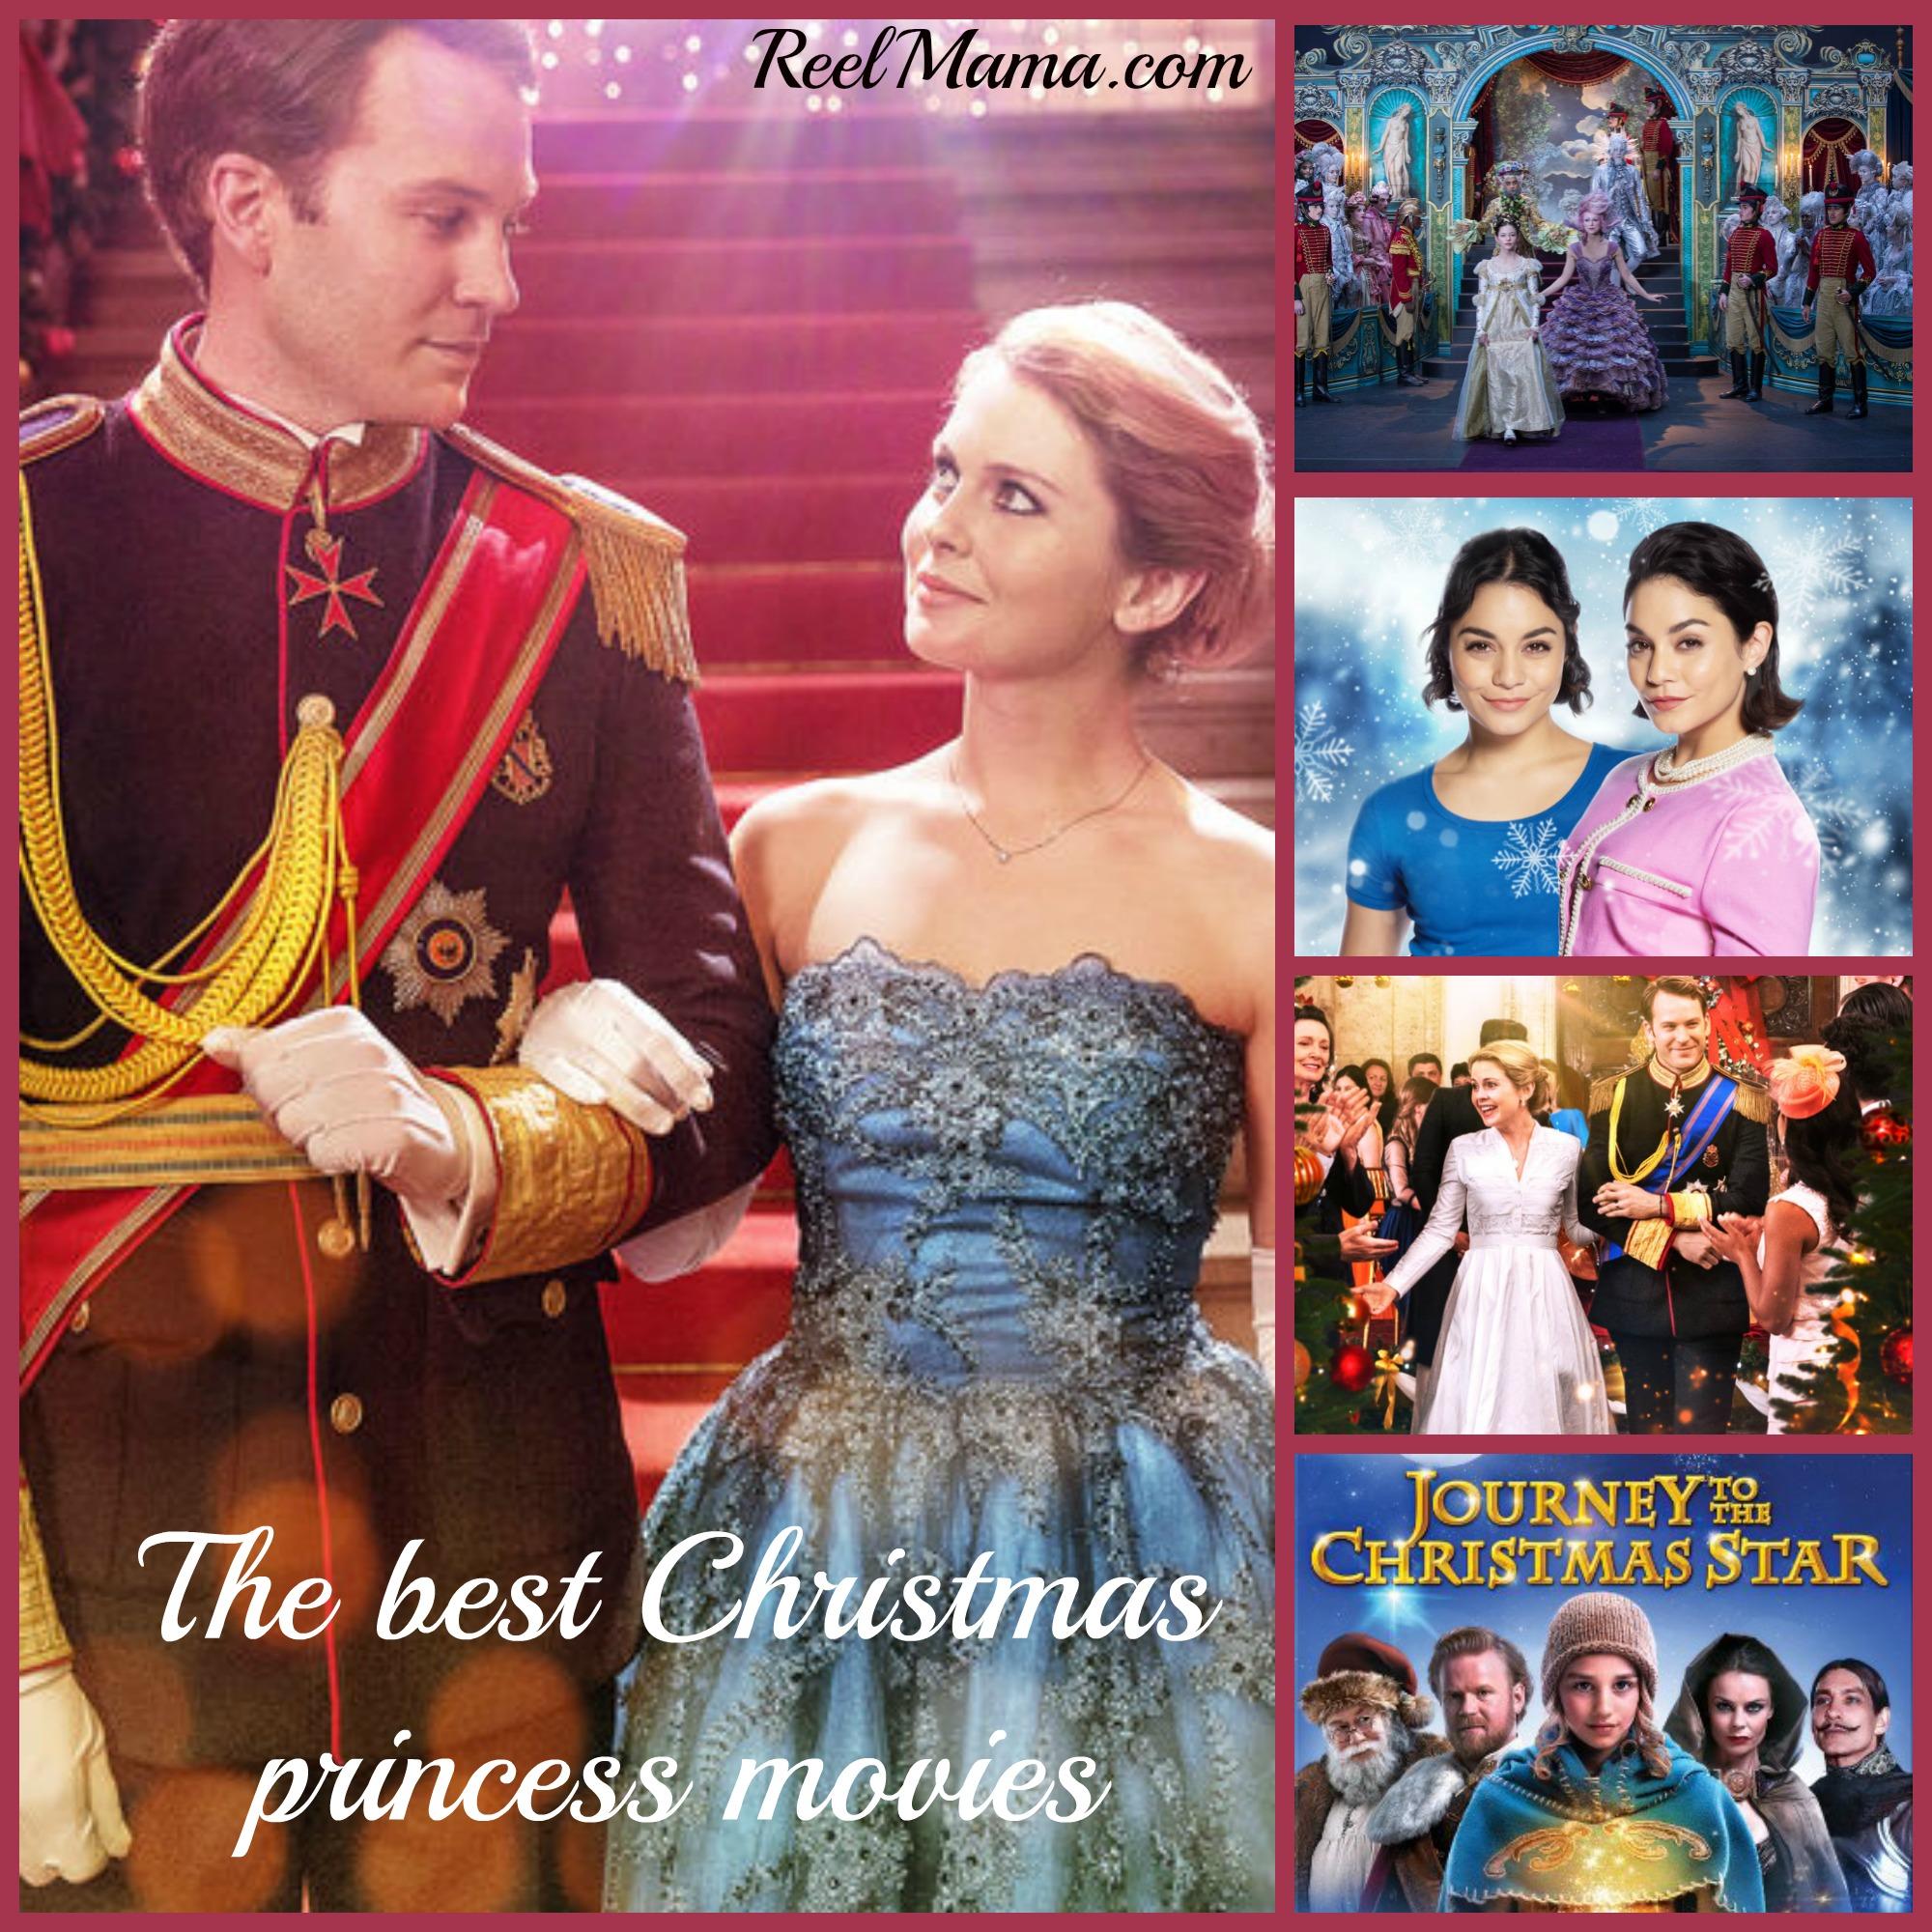 A Christmas Princess.The Best Christmas Princess Movies Reelmama Com